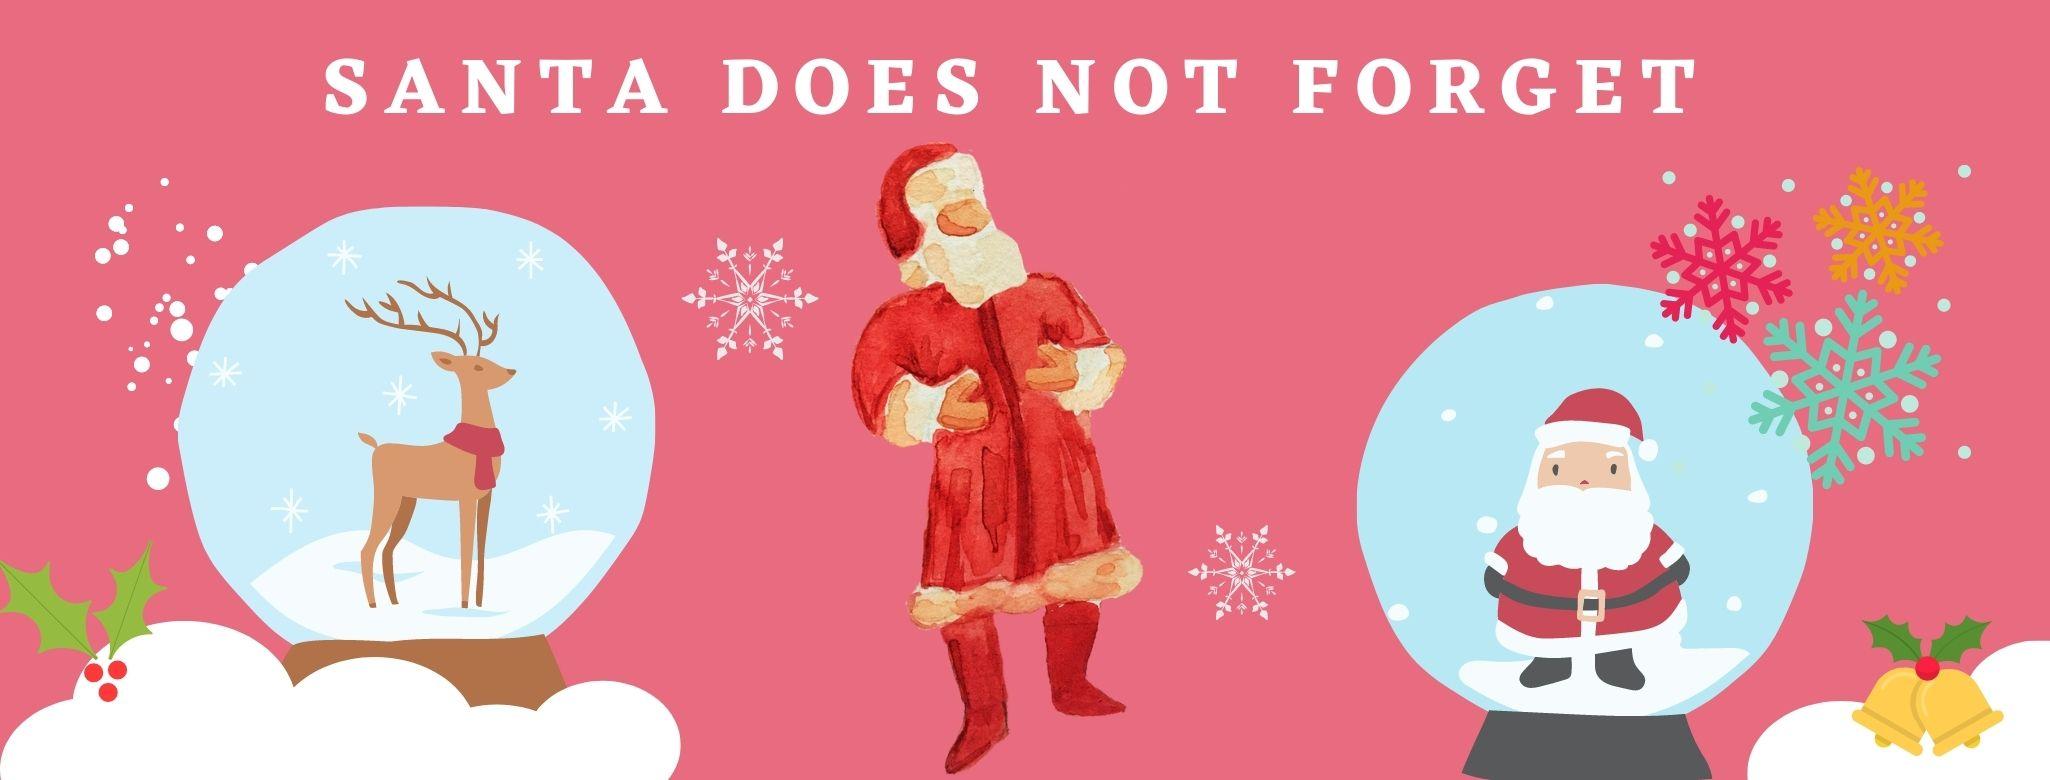 Santa Christmas stories for children kids students